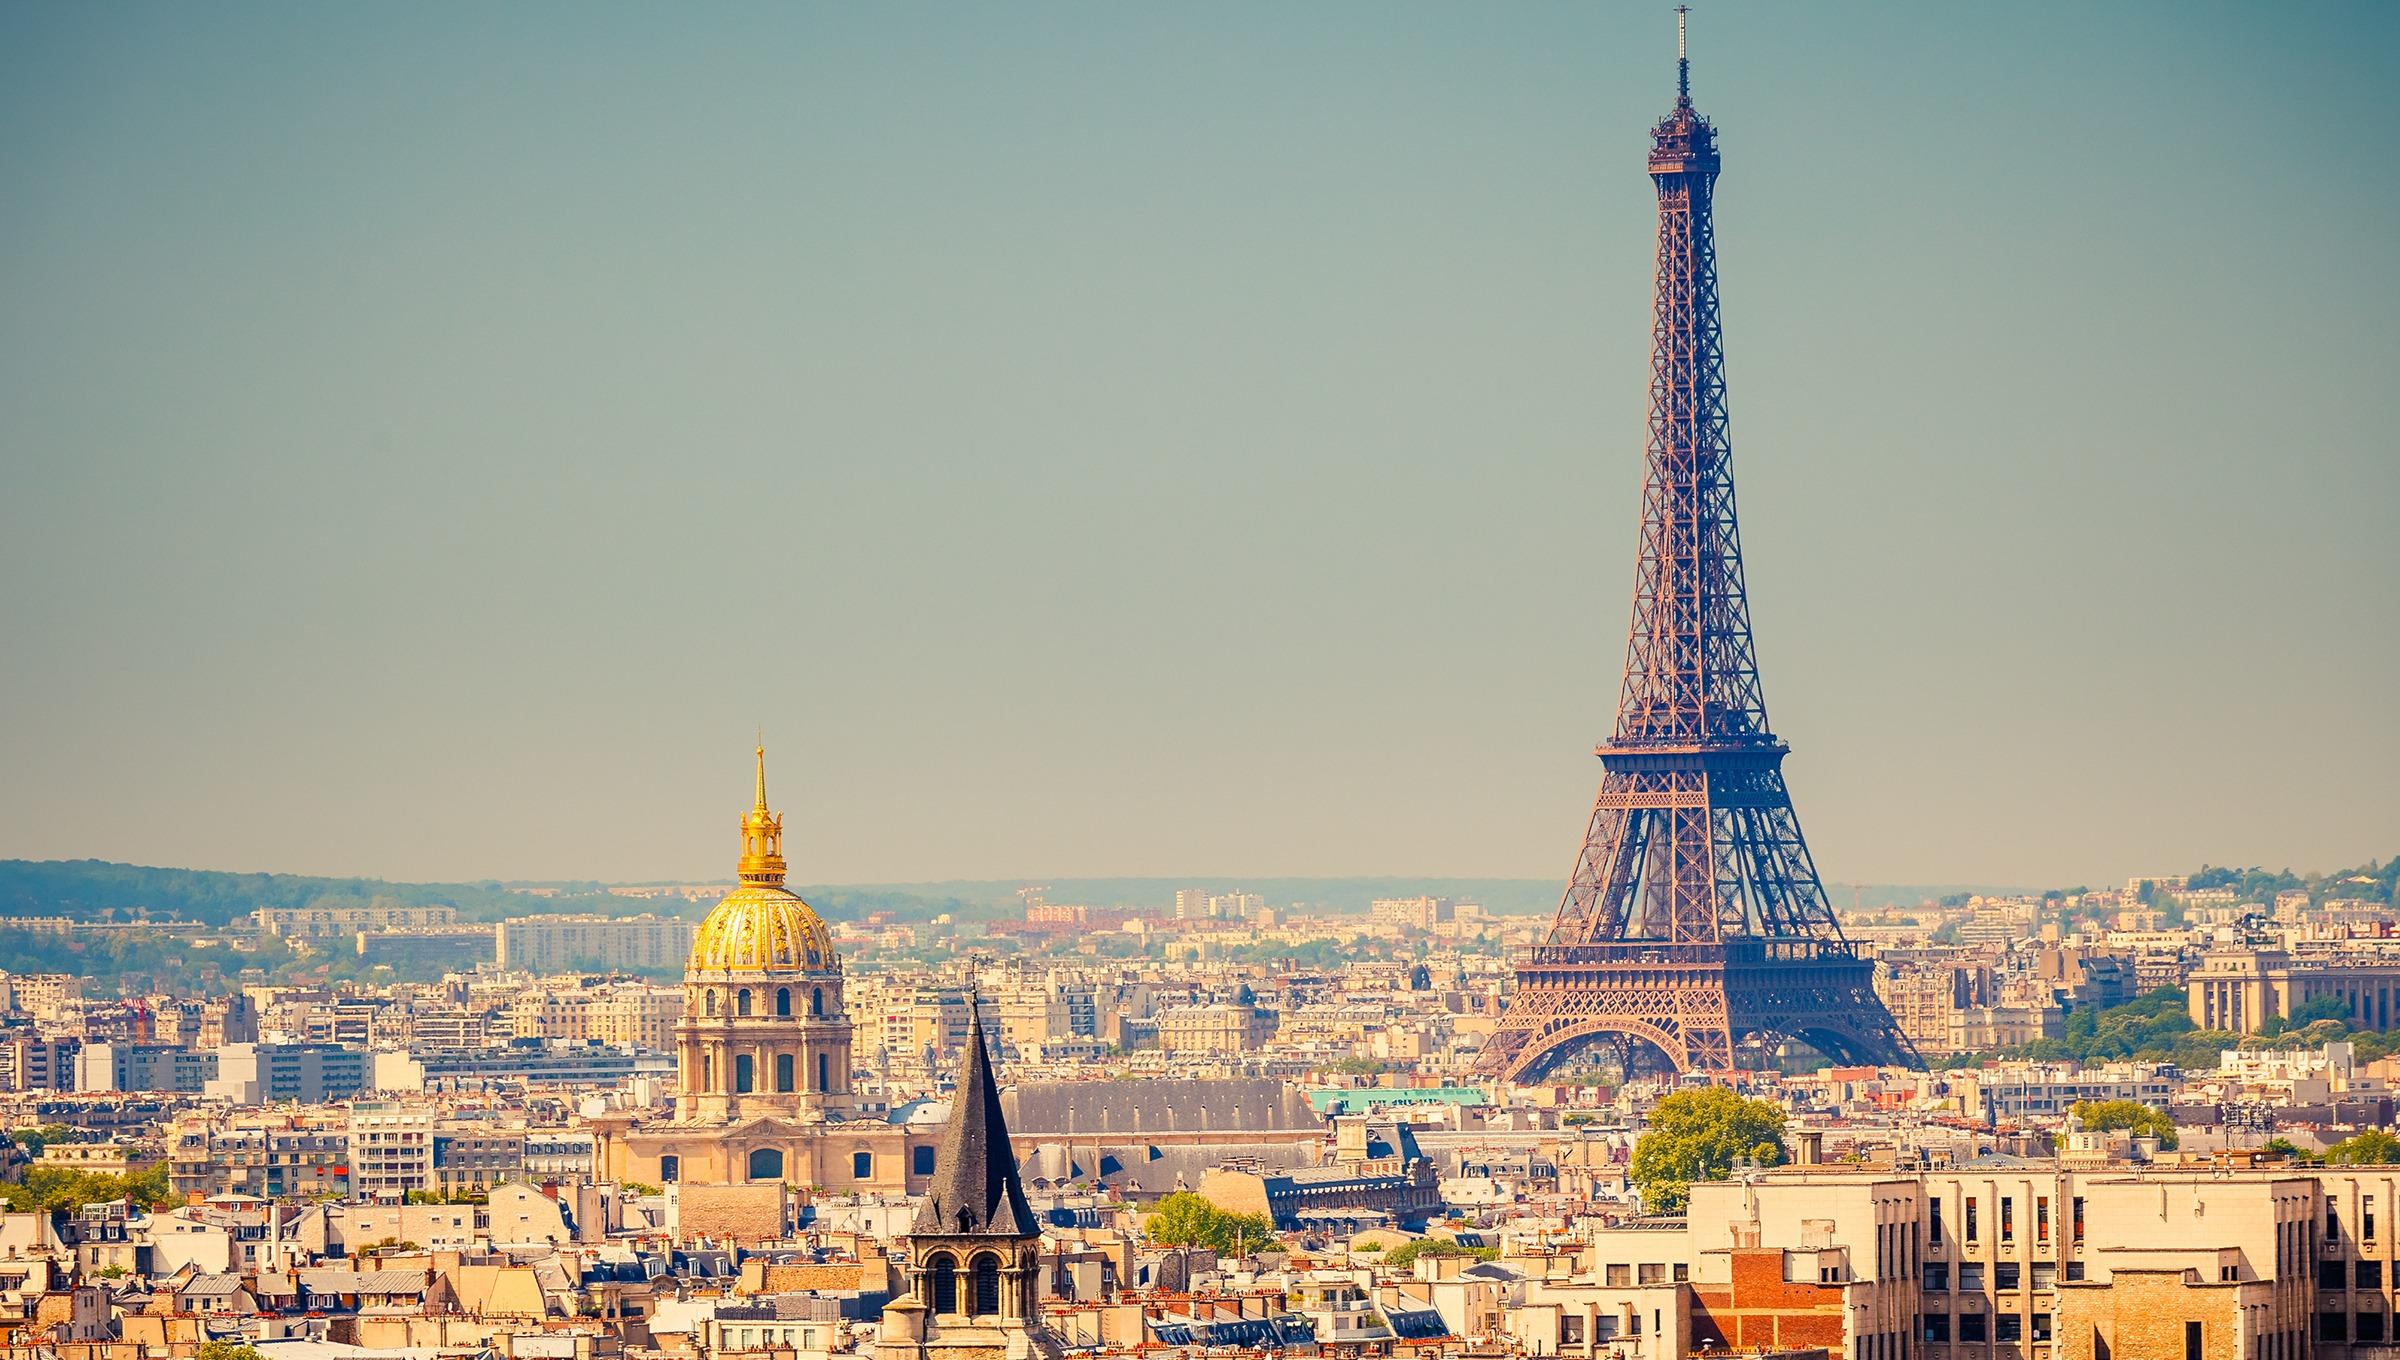 paris at day